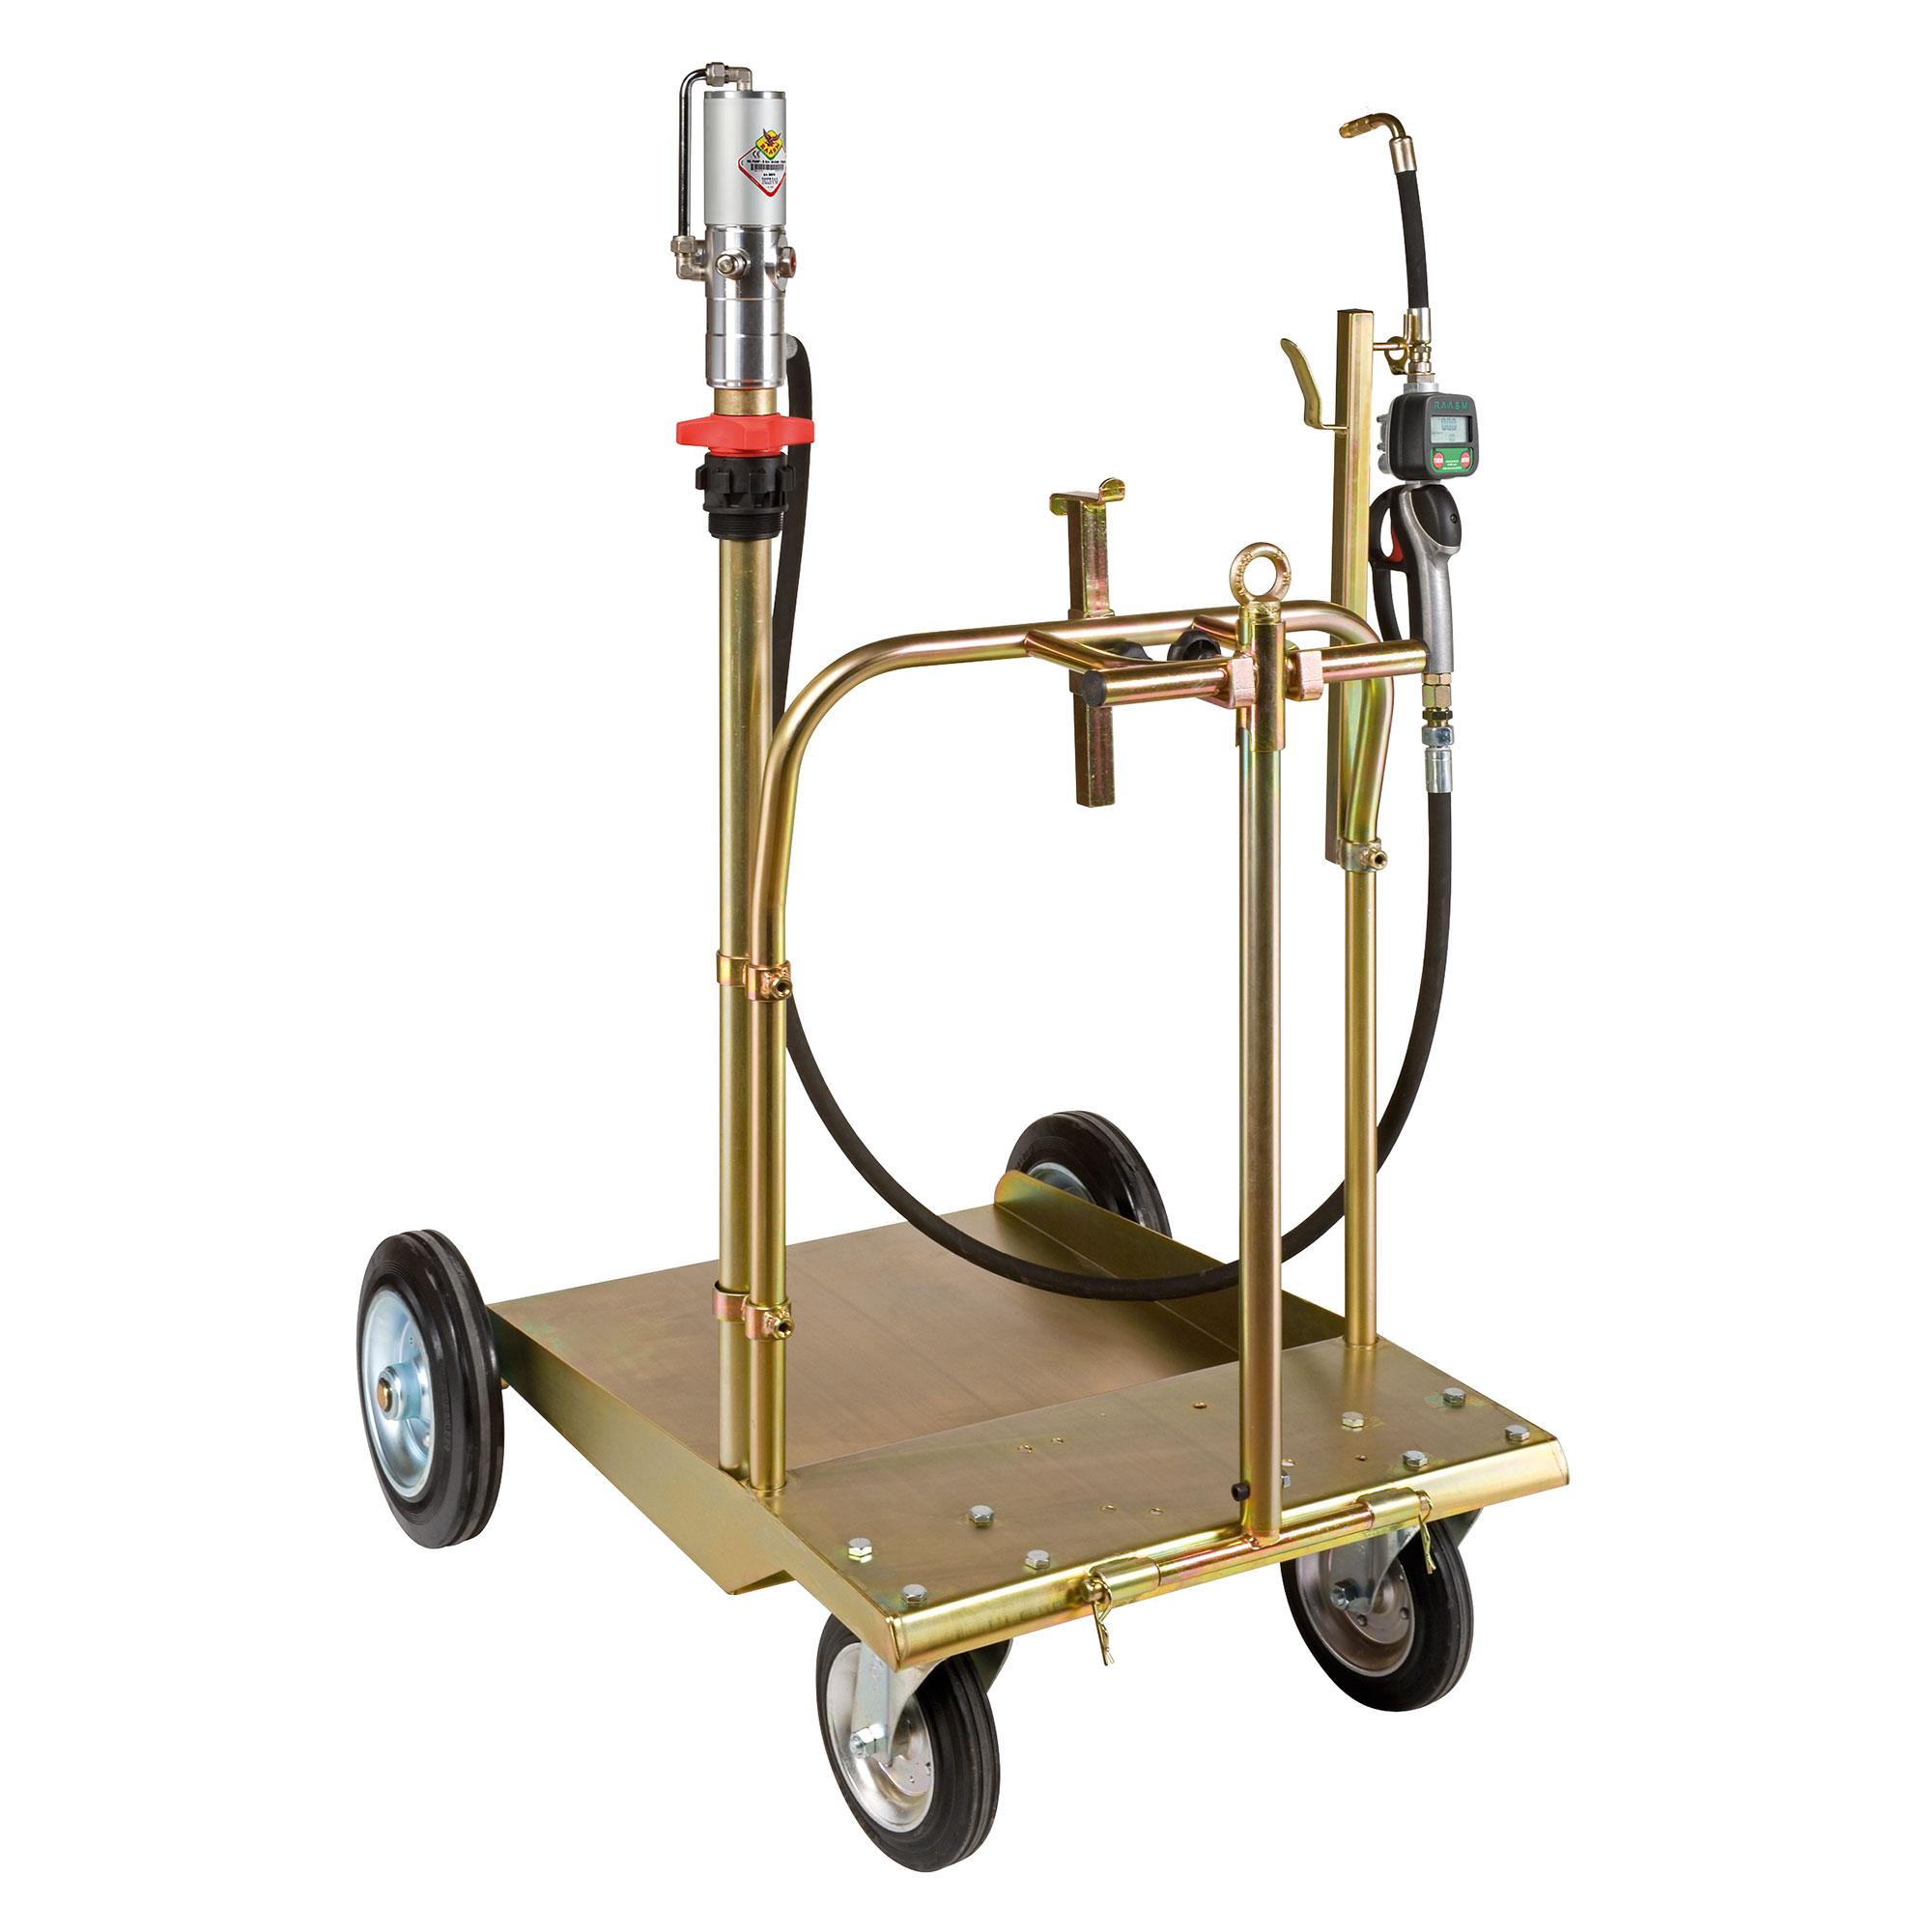 37150 - 5:1 High Pressure, High Volume Super Trolley Dispensing Kit